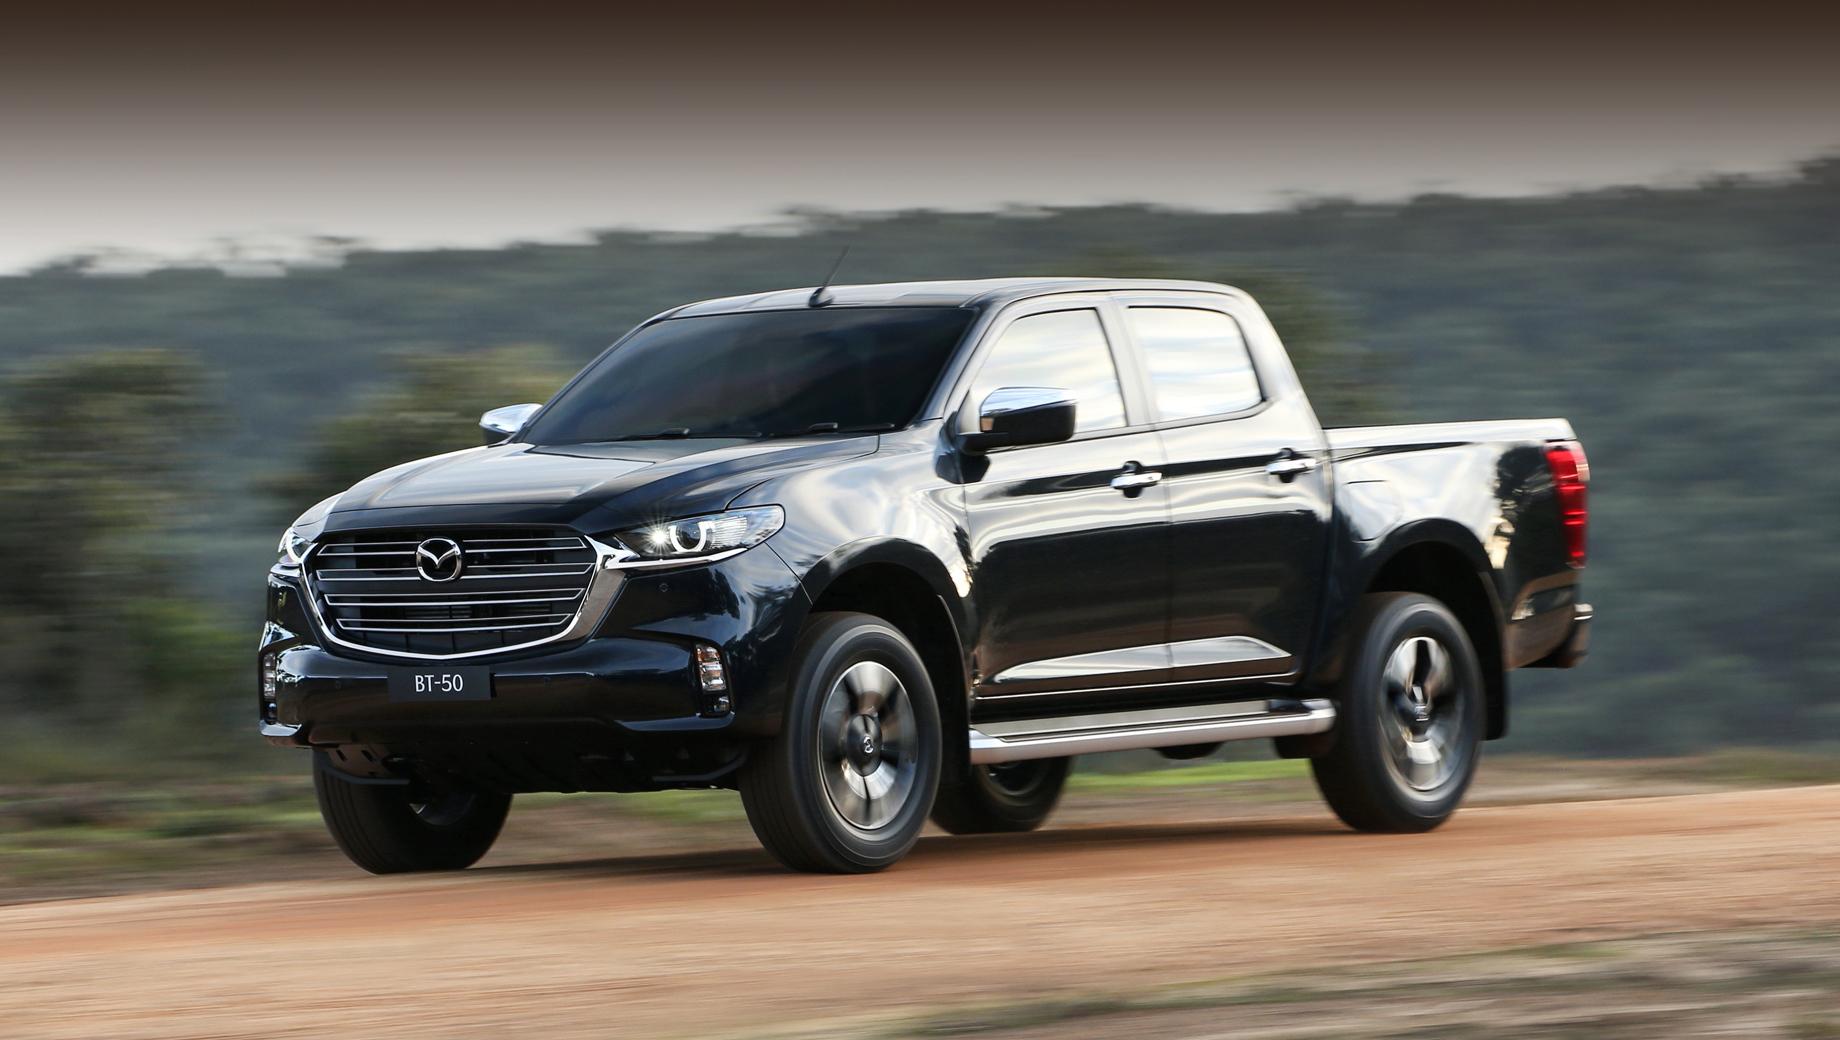 Mazda reveals brand-NEW MAZDA BT-50